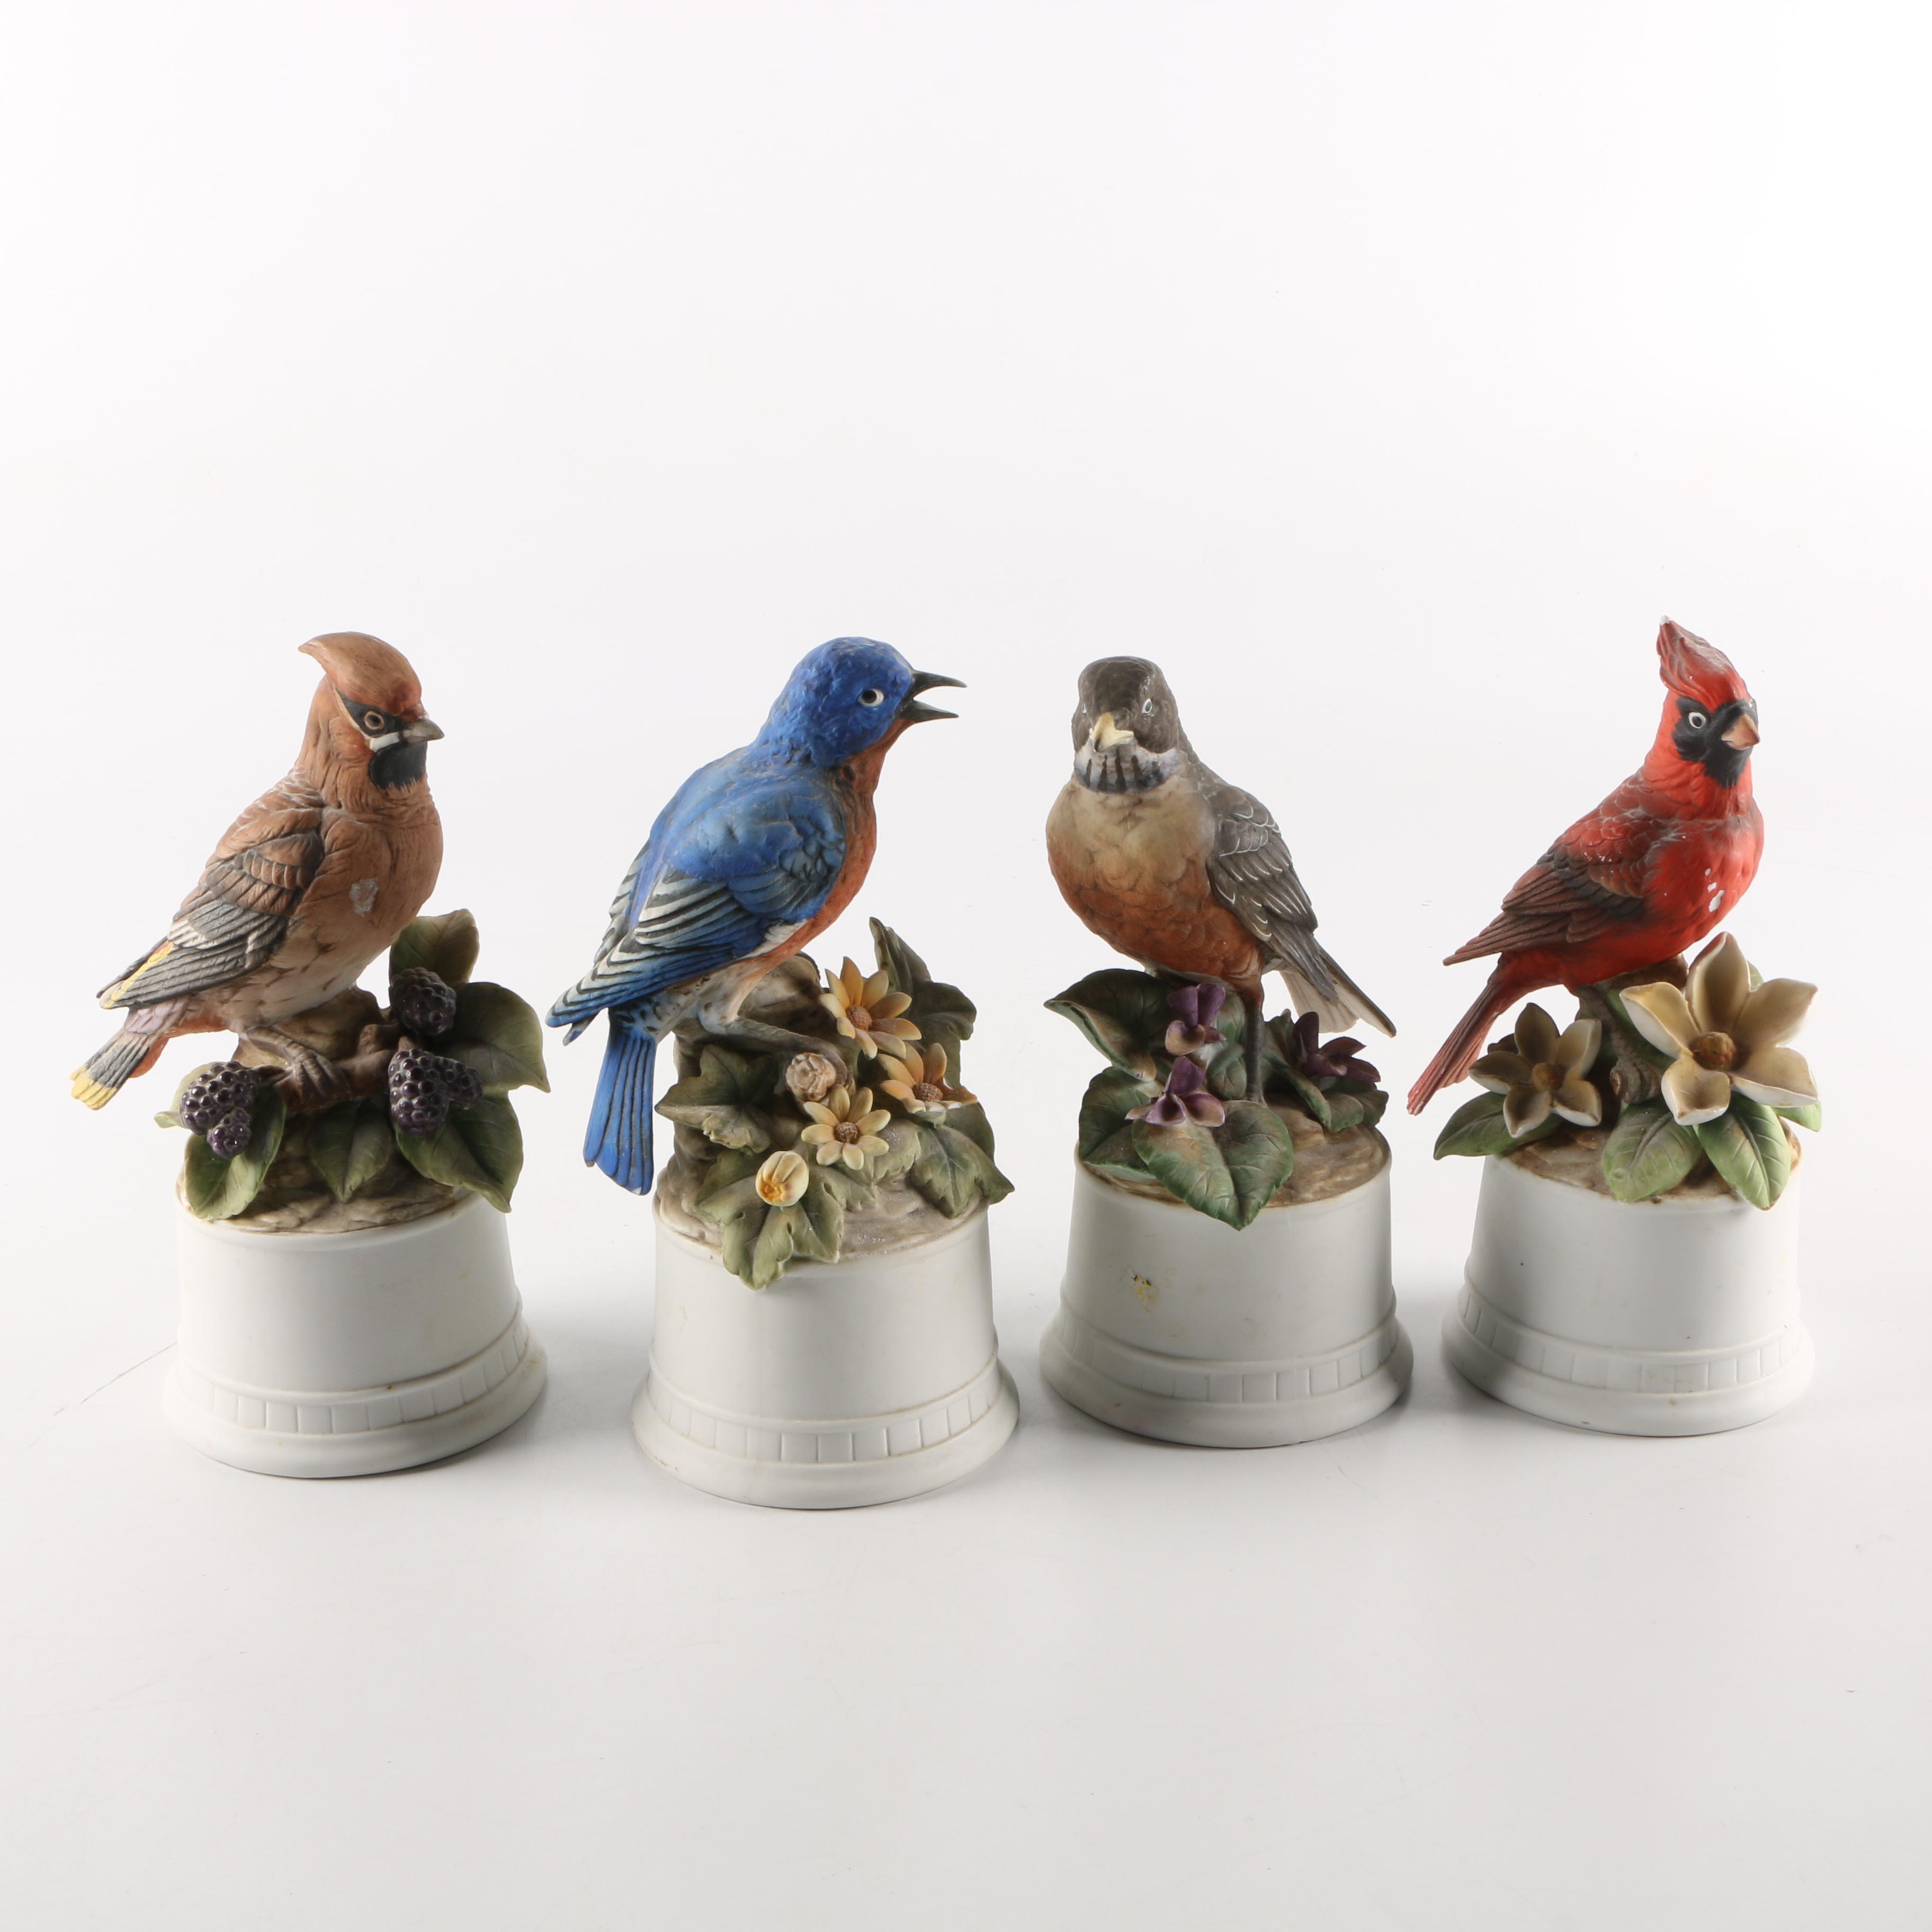 Lefton Hand Painted Porcelain Bird Figurines